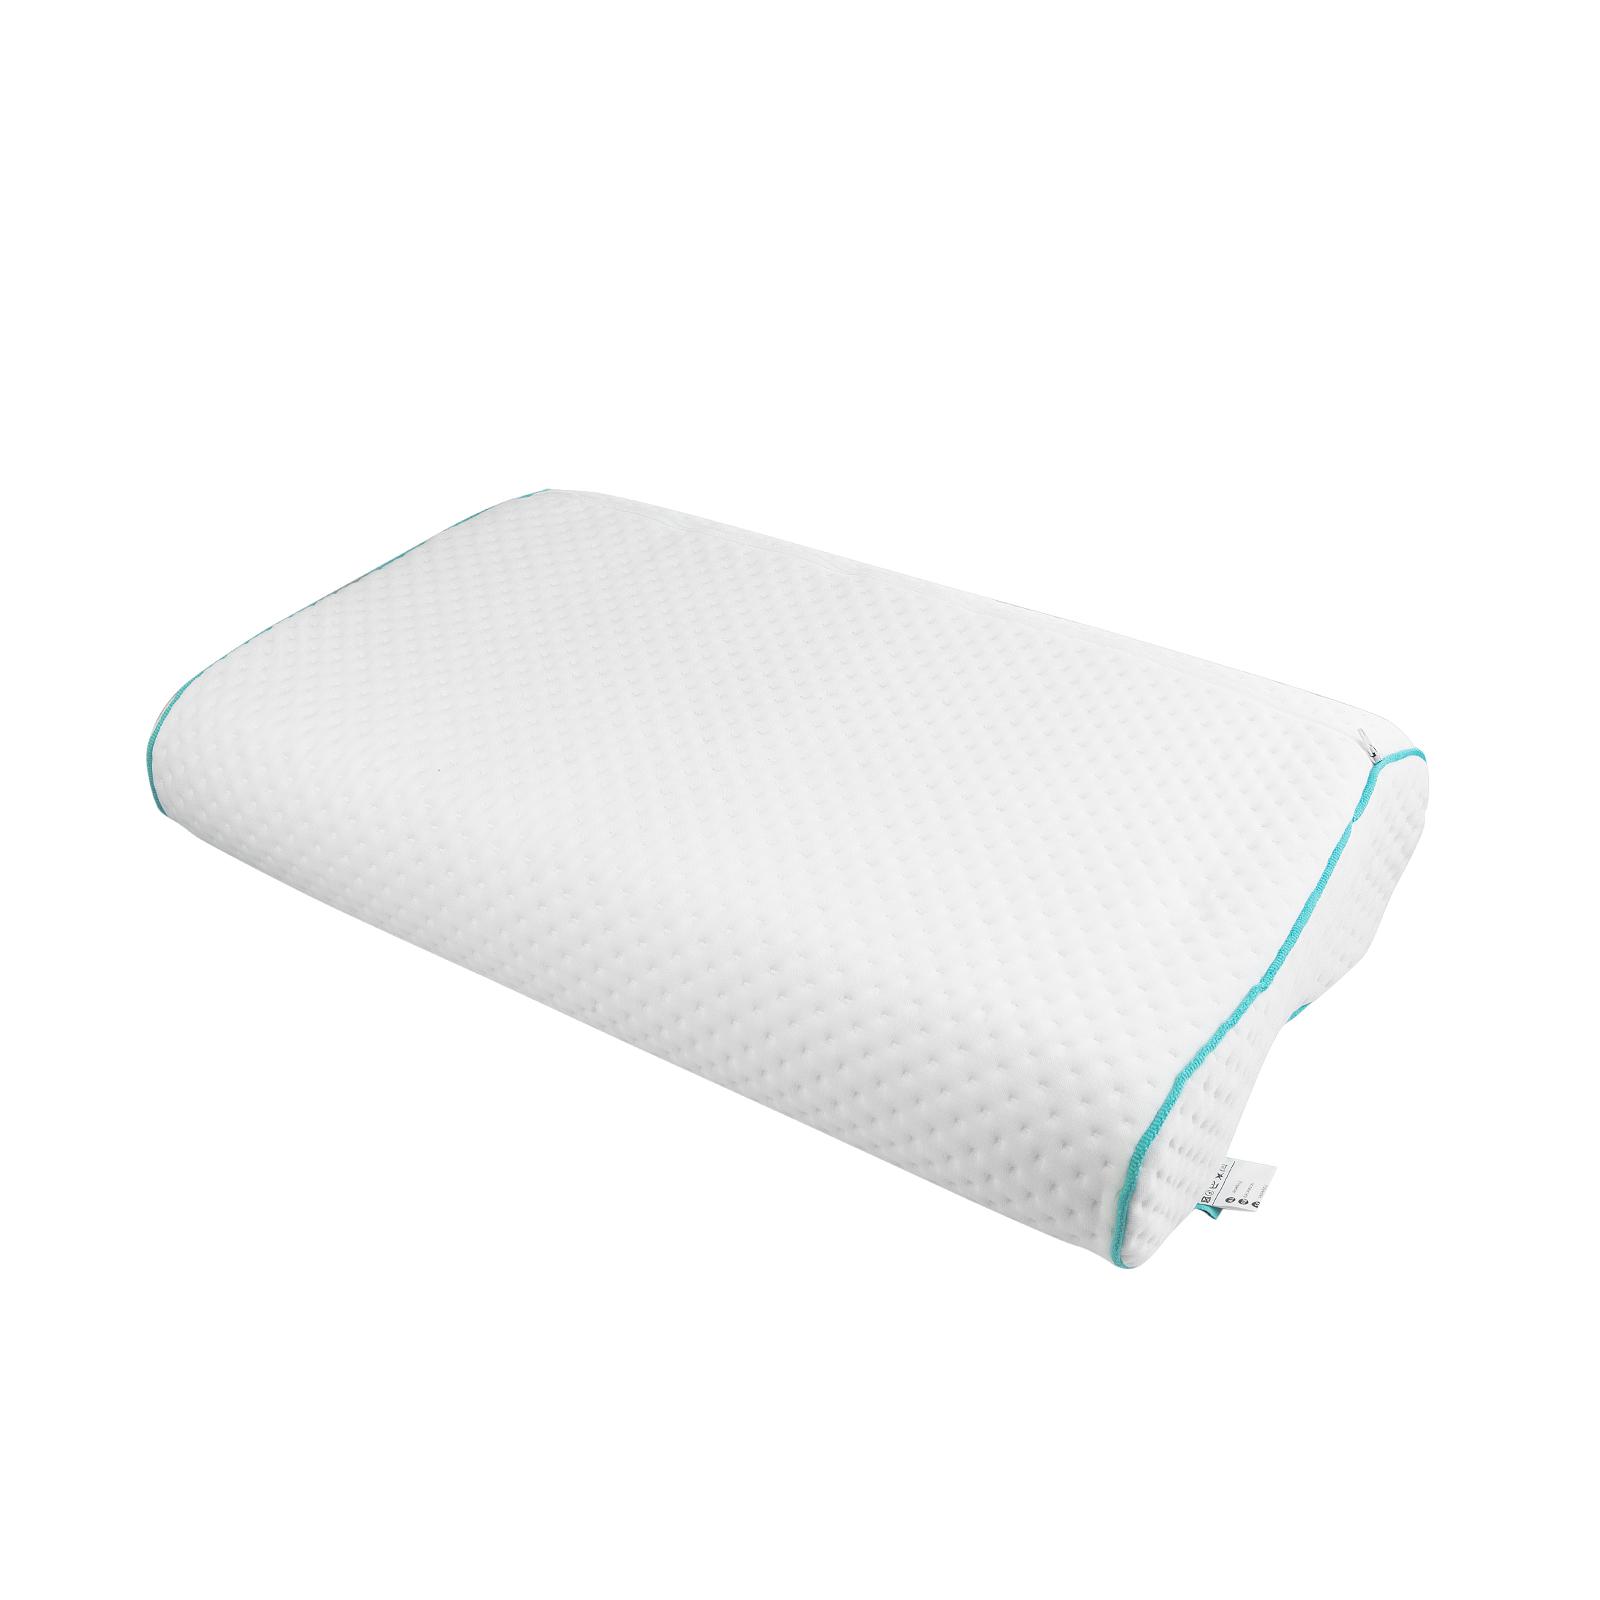 Karaca Home Visco Comfy Ortopedik Yastık